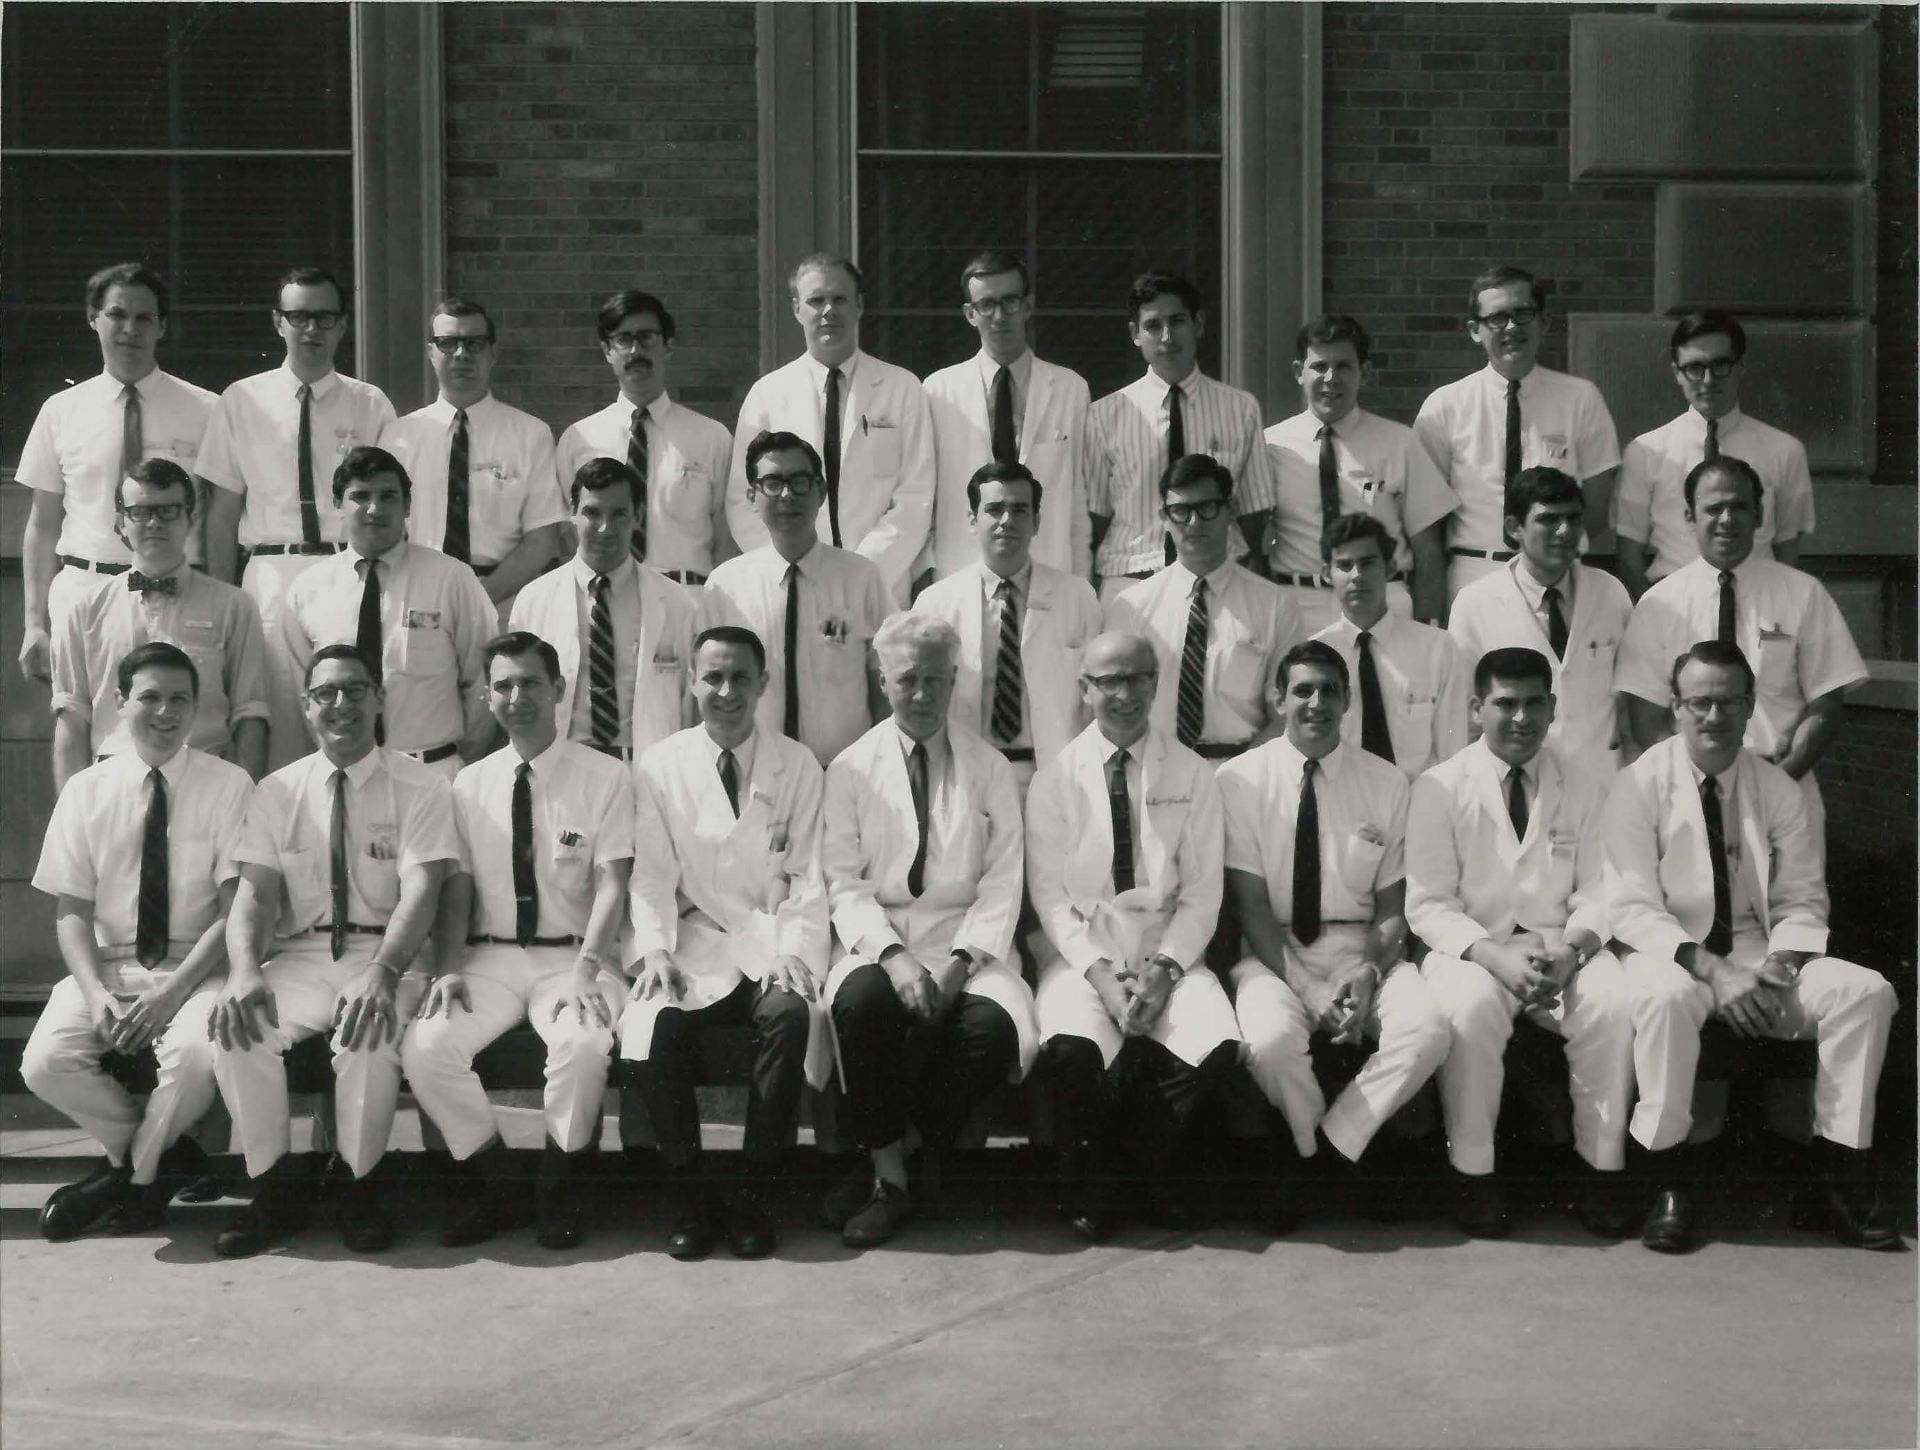 1967 Housestaff Photo (2)